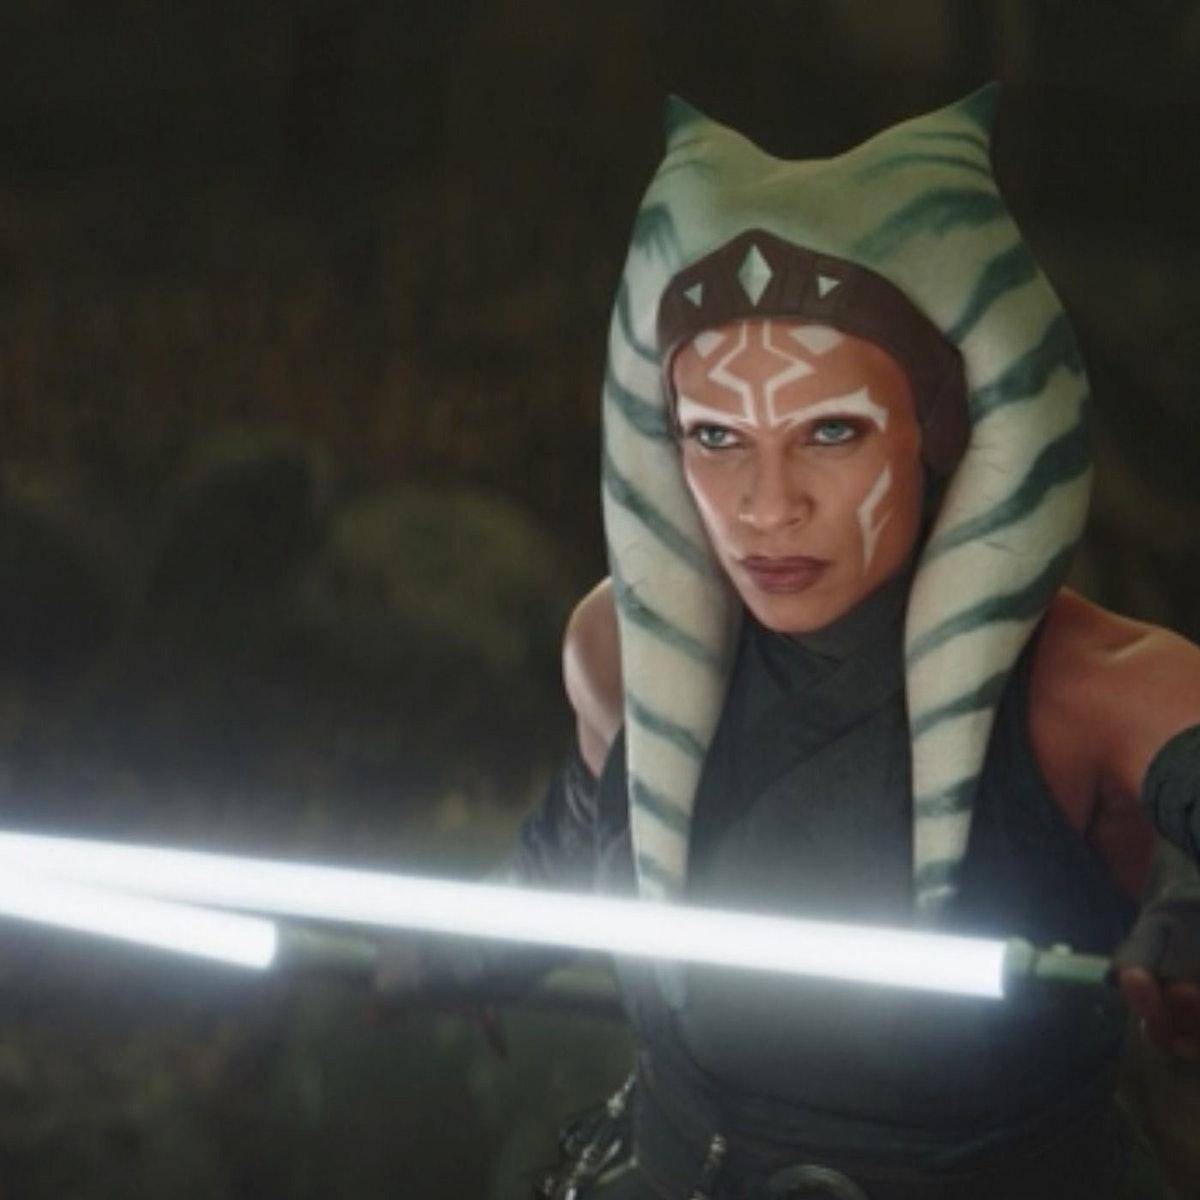 'Ahsoka': Hayden Christensen's return could fix 2 massive Star Wars plot holes